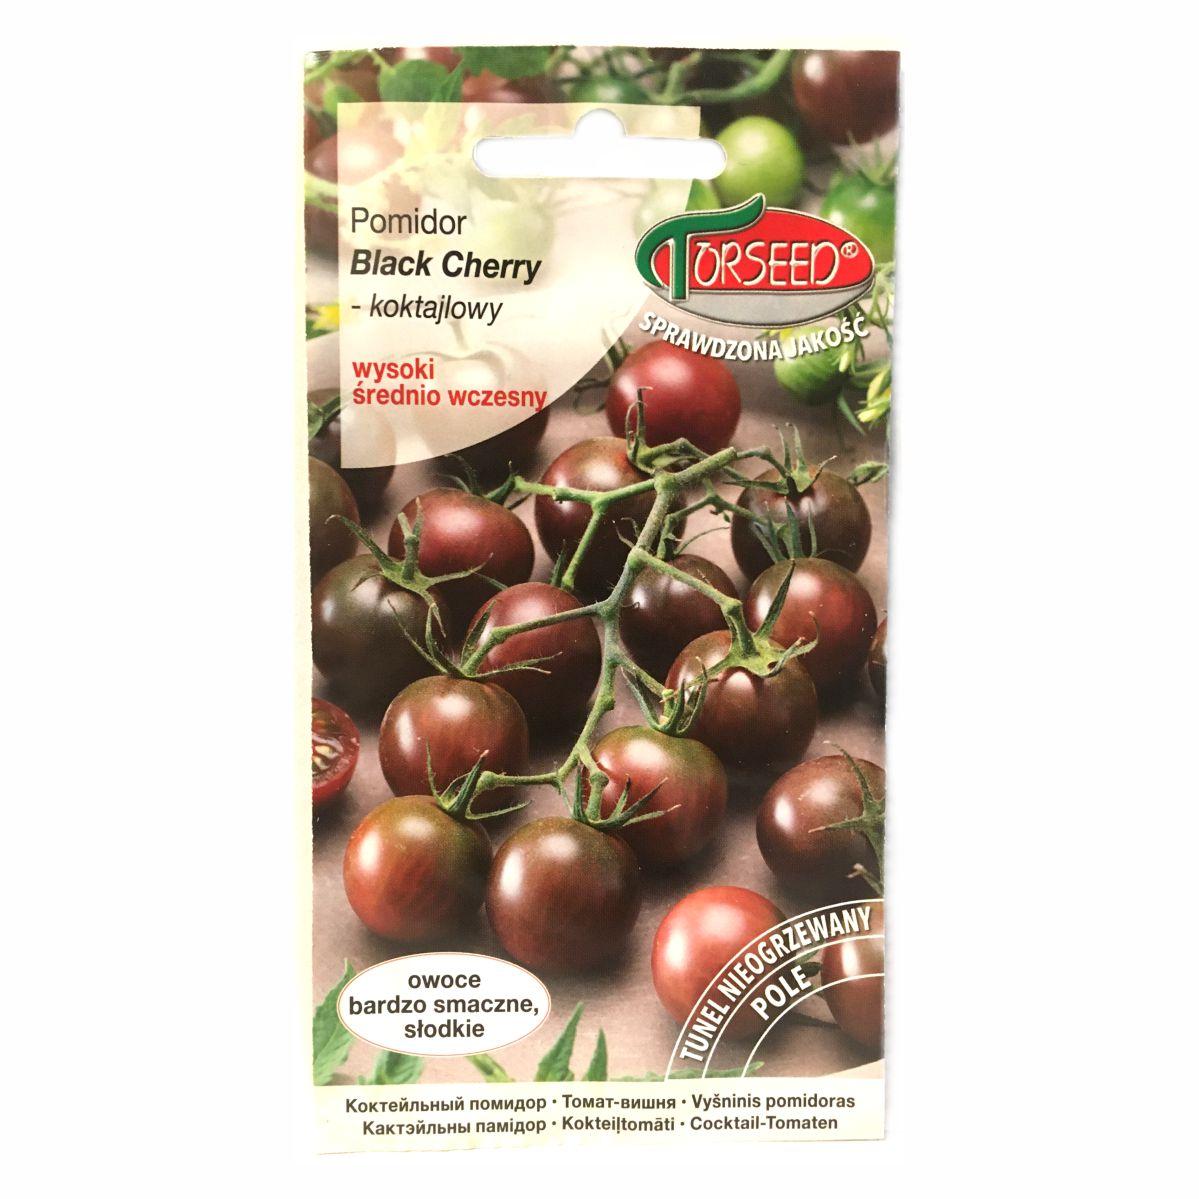 Pomidor Black Cherry nasiona Torseed